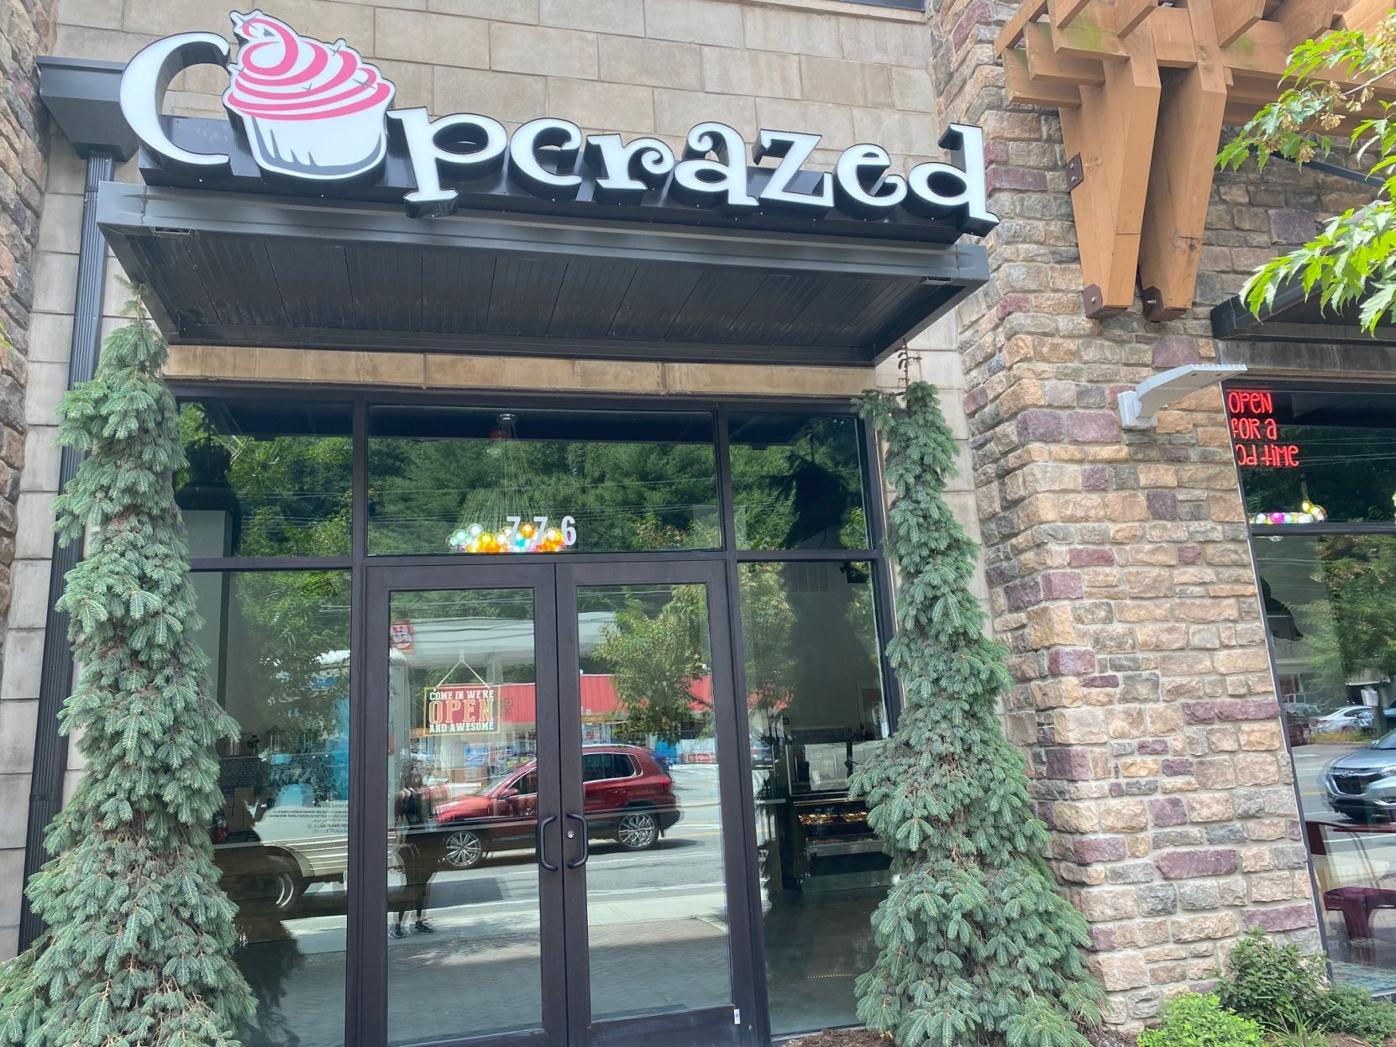 Cupcrazed storefront